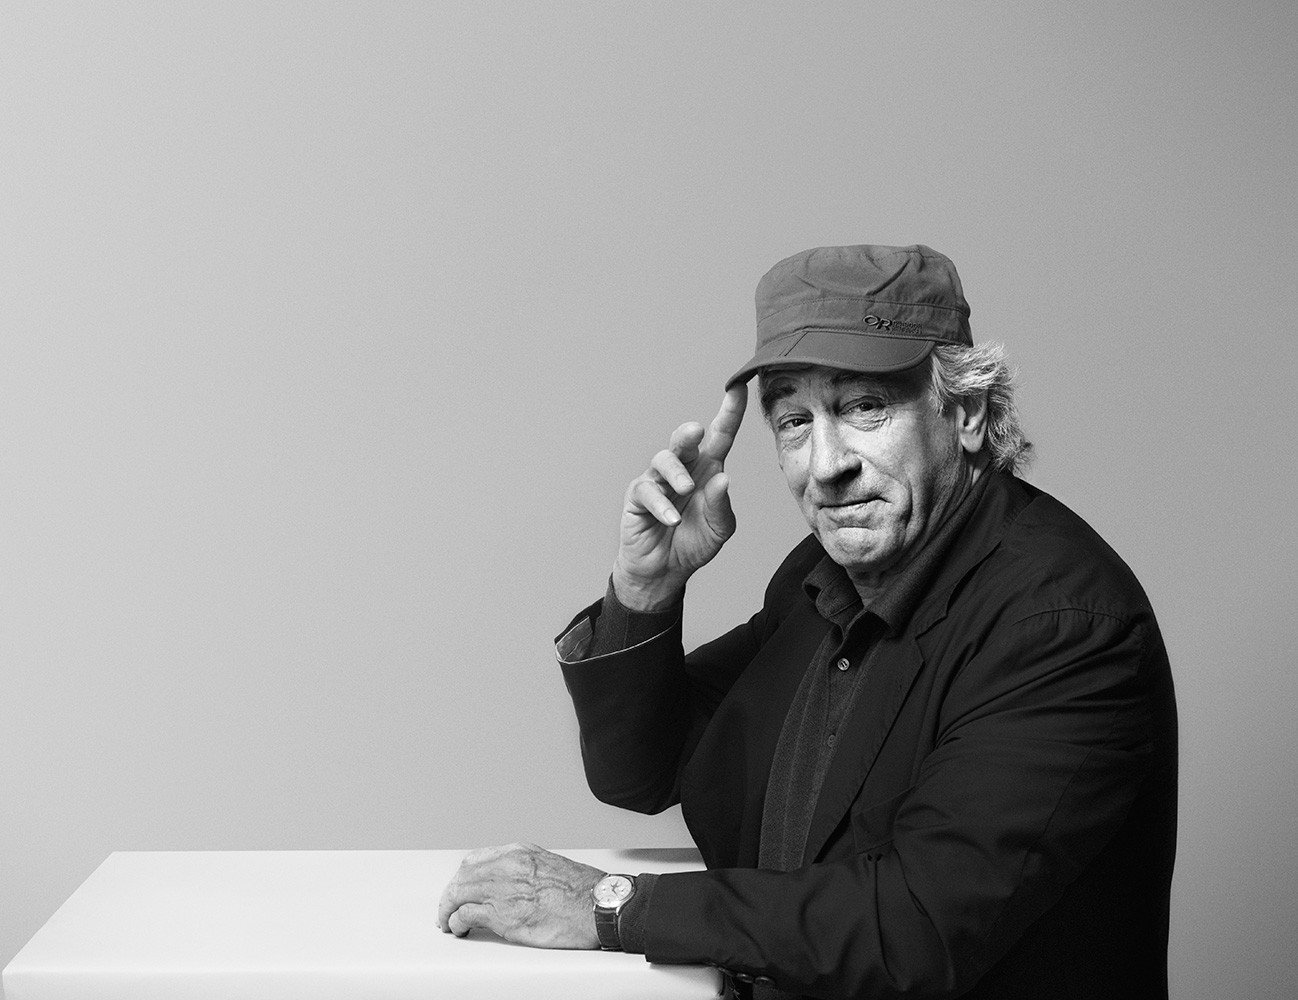 Robert de Niro, London, 5th November 2015